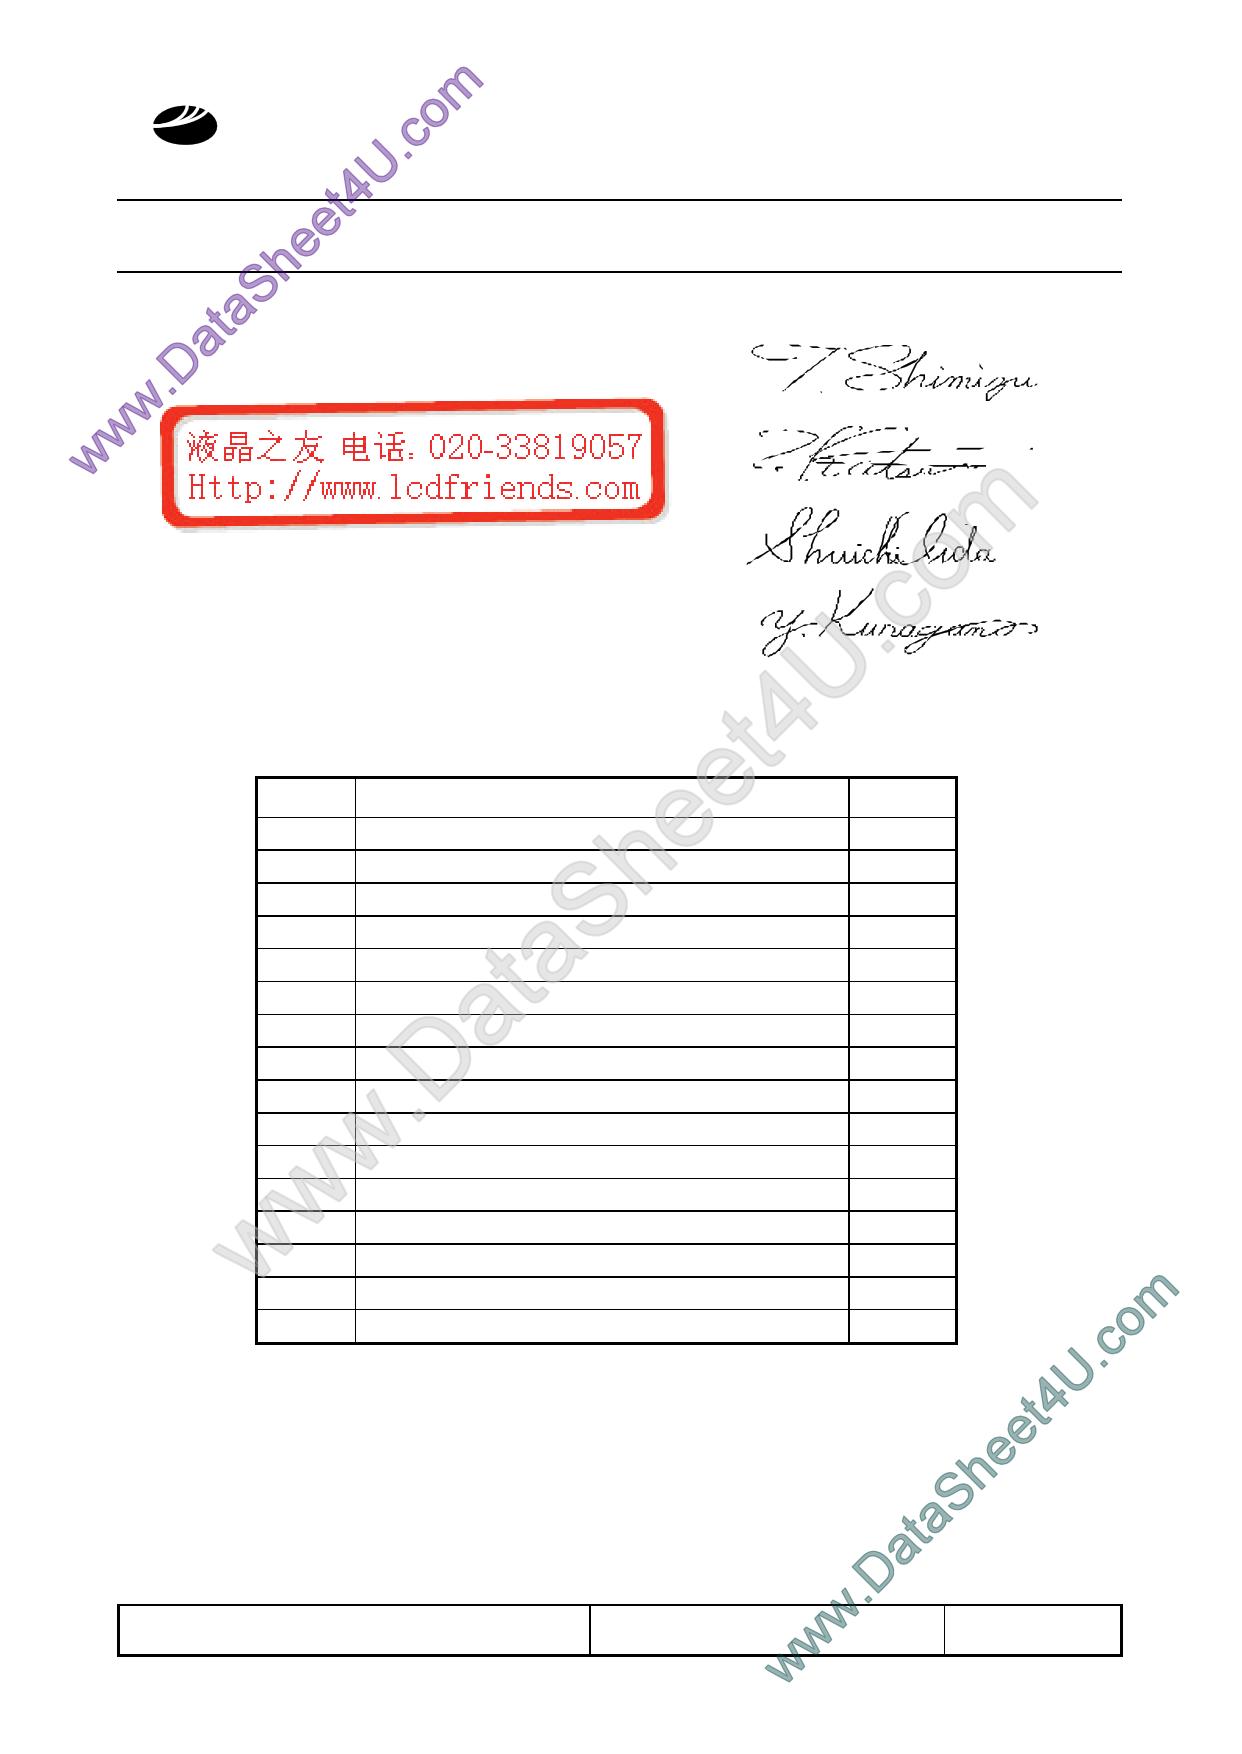 T-51382D064-FW-P-AC Hoja de datos, Descripción, Manual